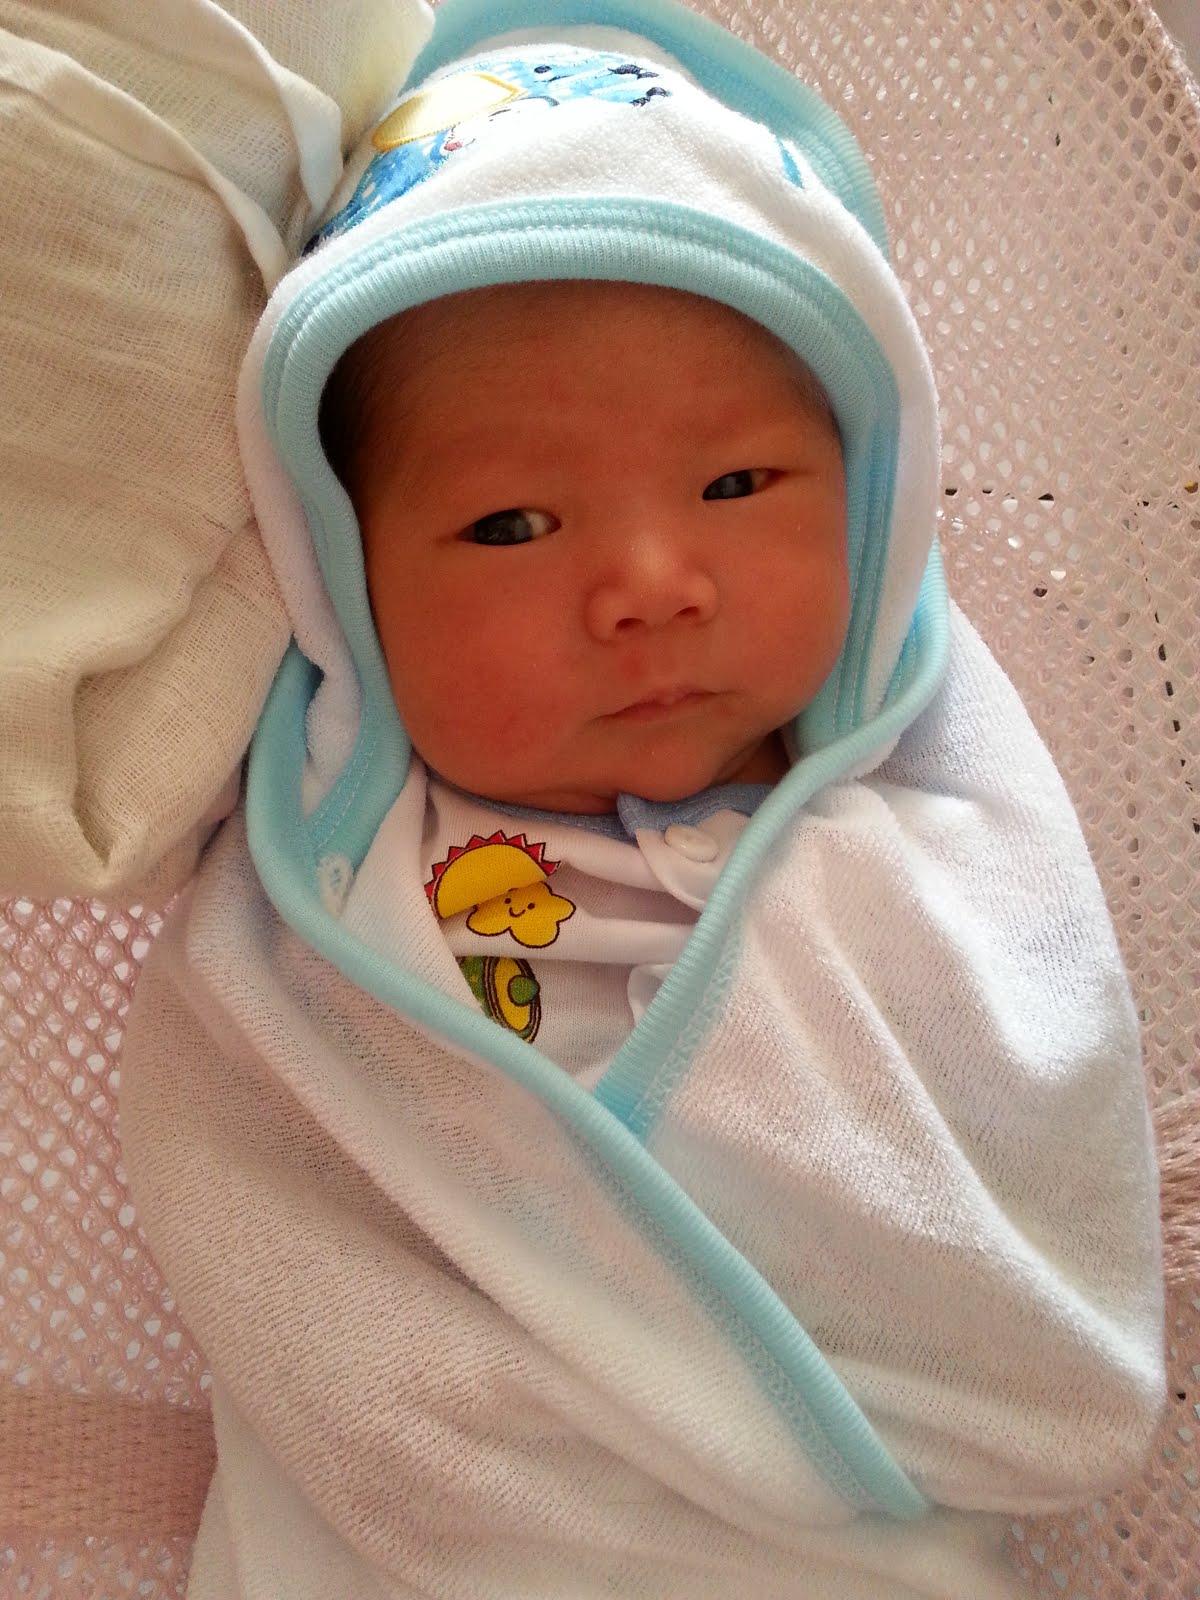 Adrian @ Hong Hong